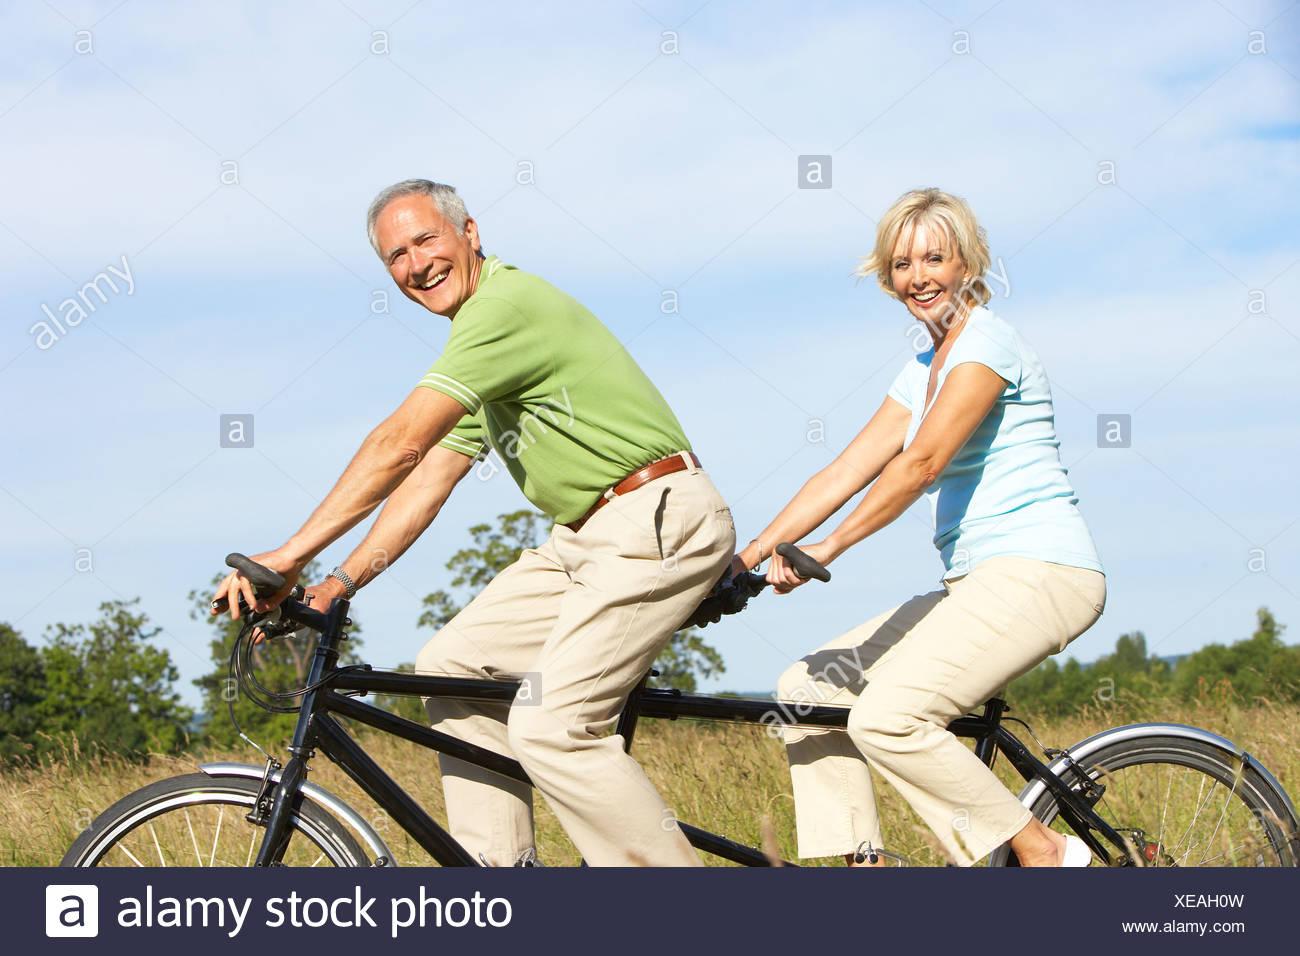 mature couple riding tandem stock photo: 284203945 - alamy